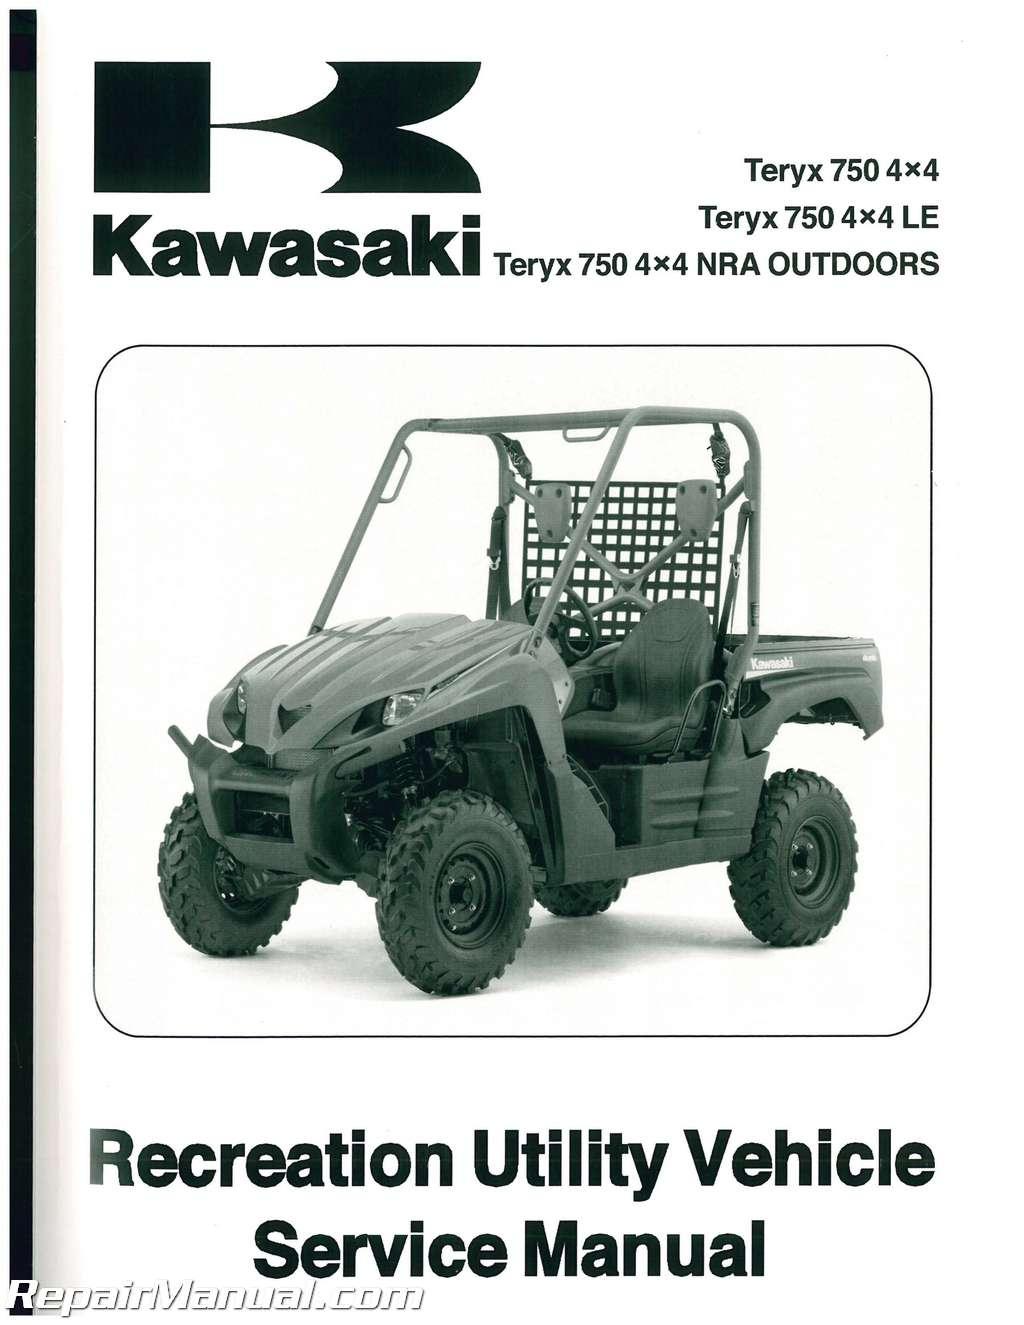 2008 kawasaki krf750a b teryx utv service manual